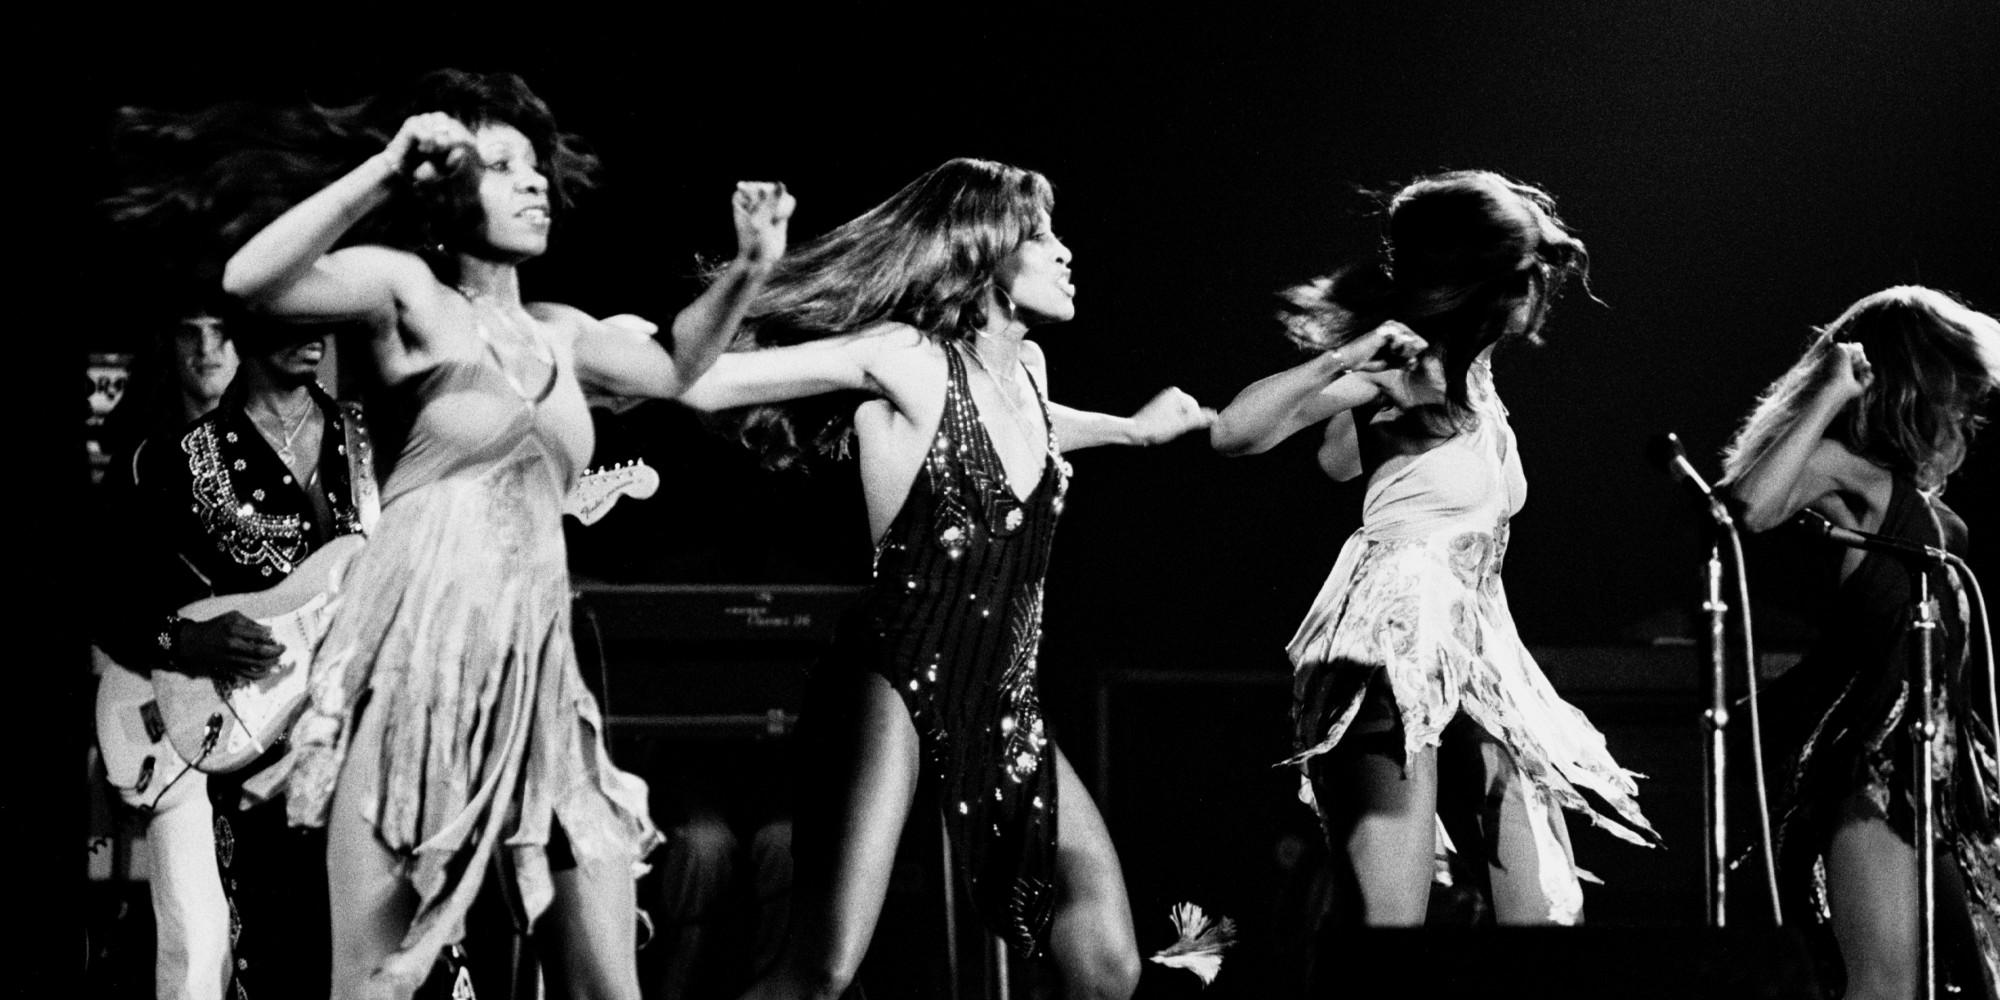 TINA-TURNER-IKETTES-facebook jpgIke And Tina Turner Backup Singers